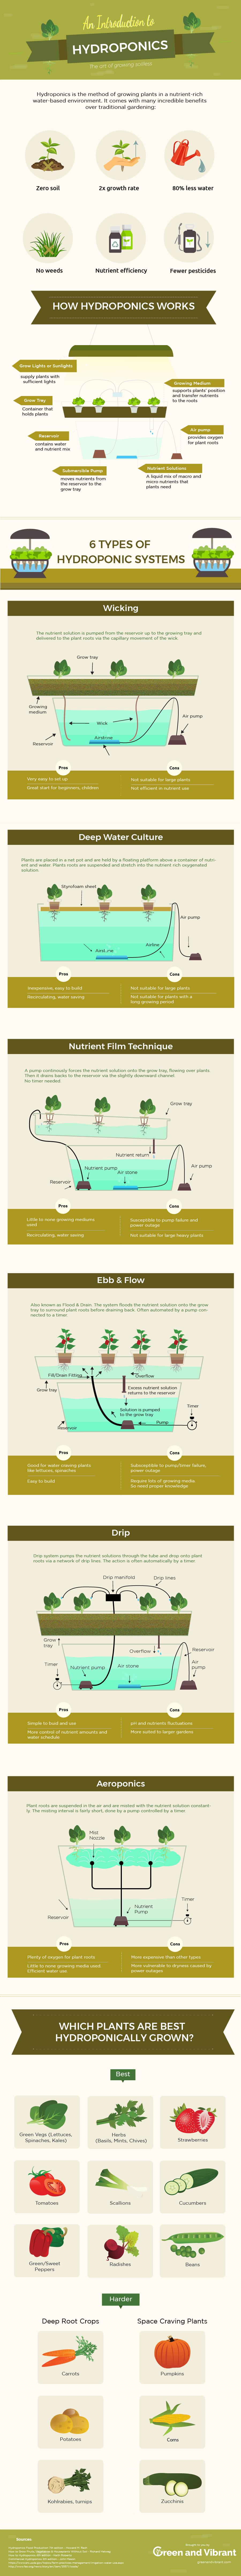 hydroponic-gardening-infographic-1